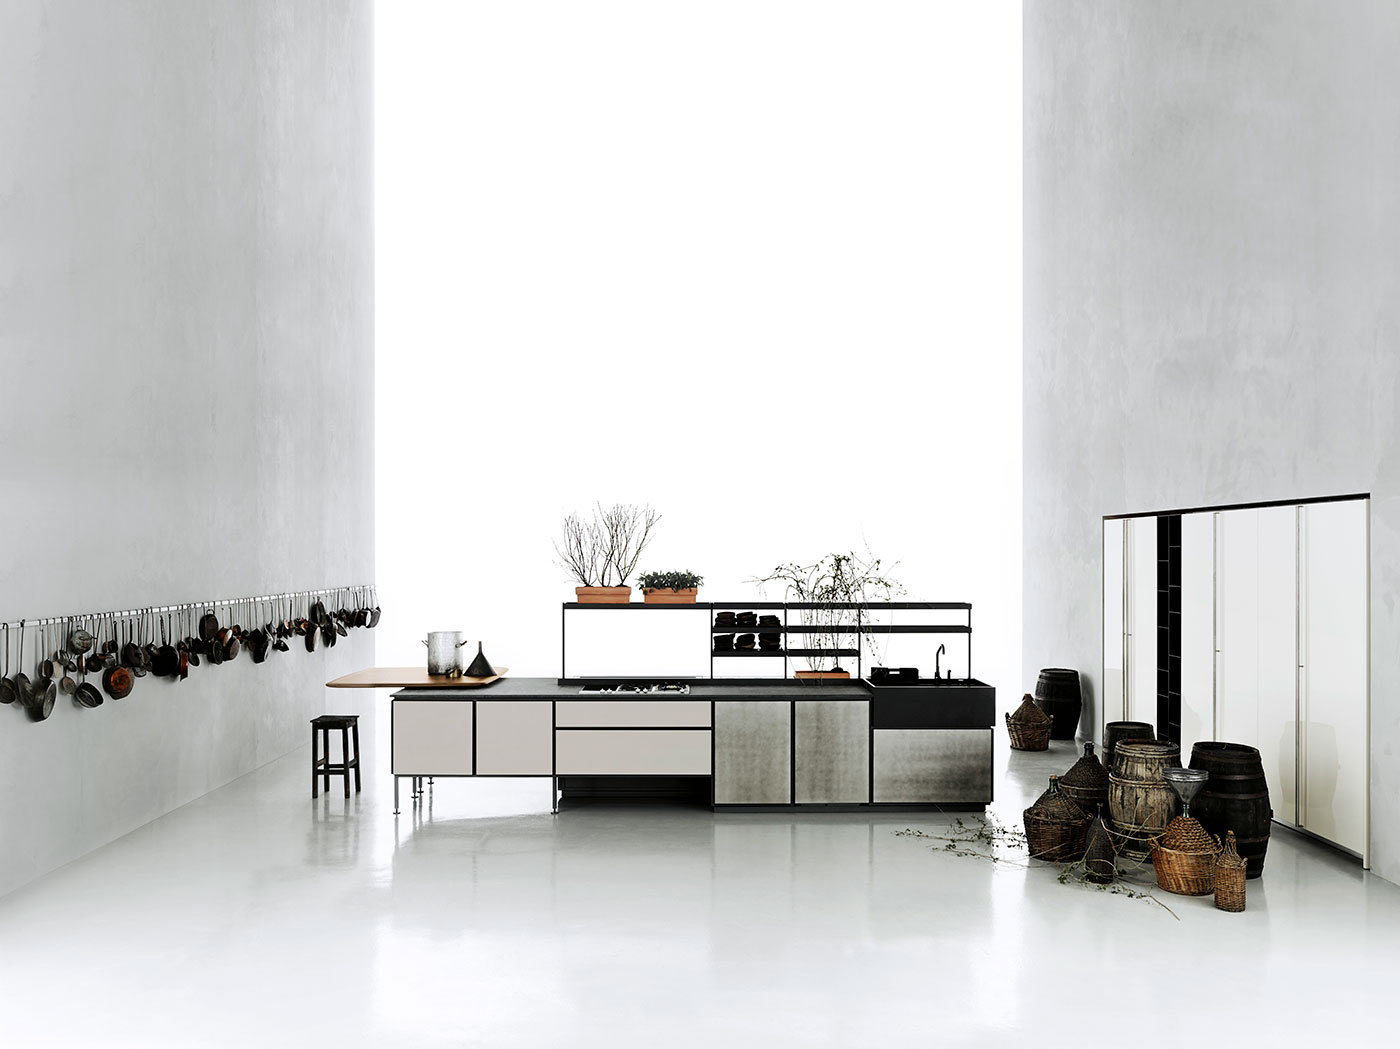 Obegi Home Boffi Salinas Kitchen and Hide By Tommasosartori High